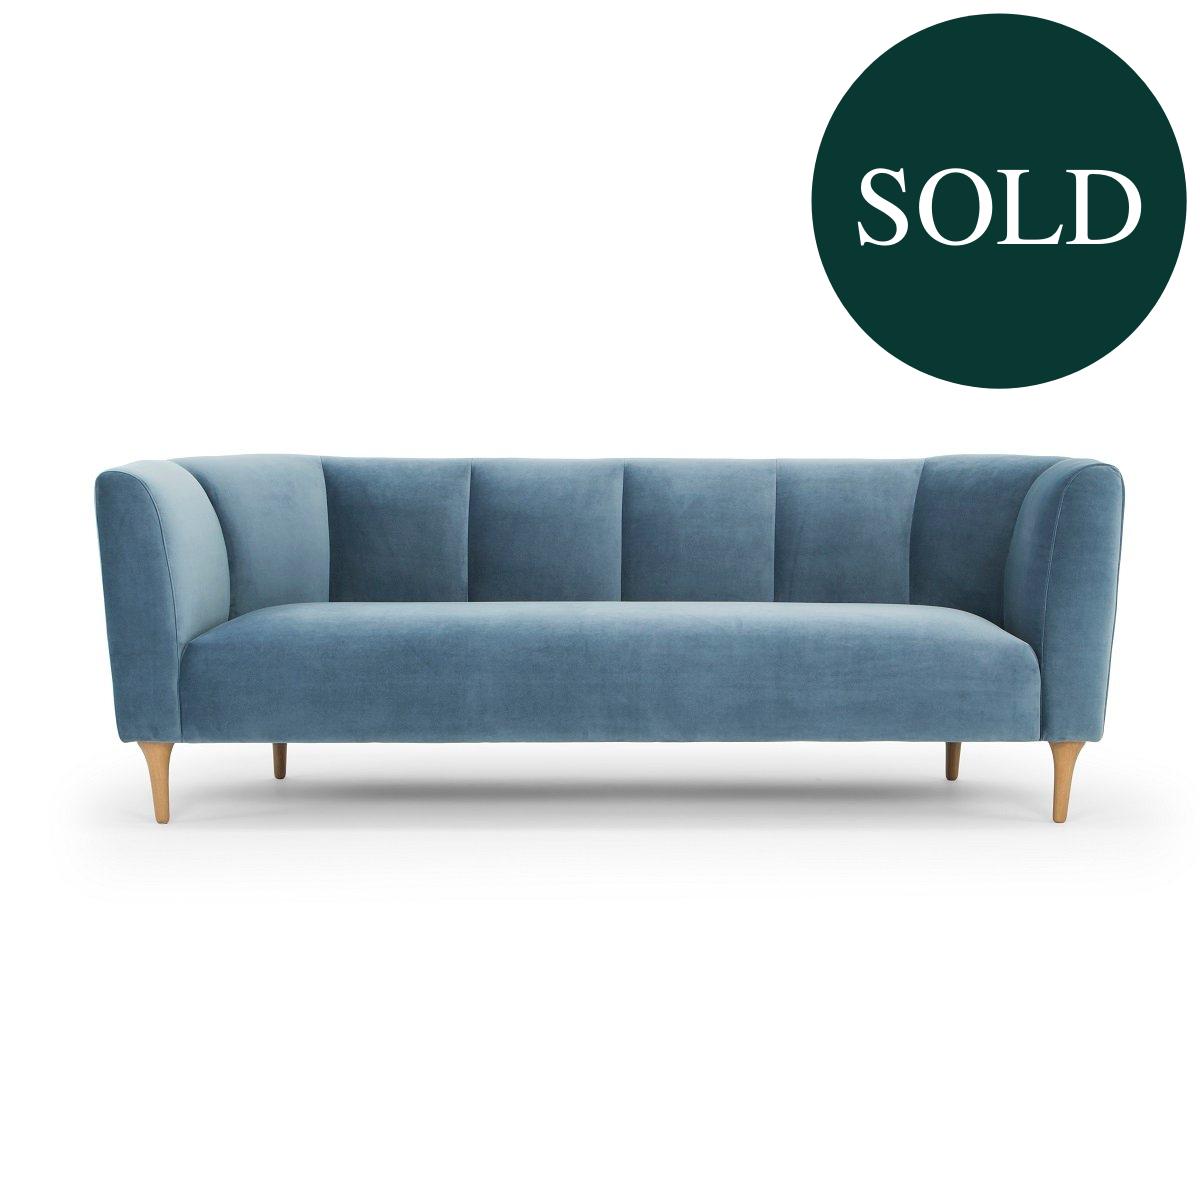 Sailor 3 Seater Sofa